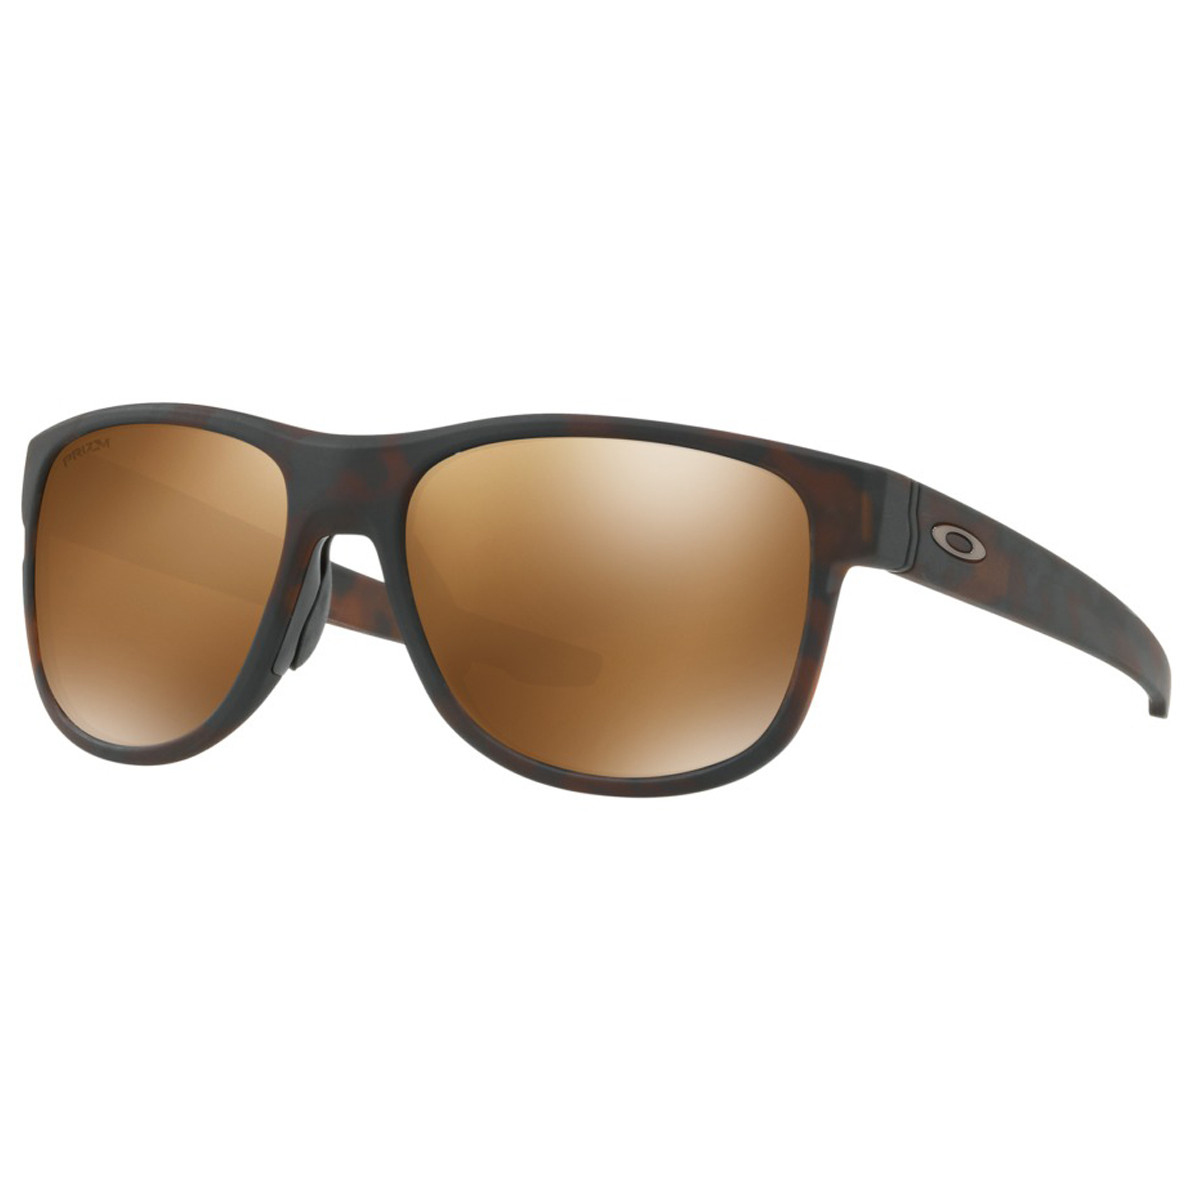 770d8b09f6620 Óculos Oakley Crossrange R Matte Tortoise  Lente Prizm Tungsten Polarizado